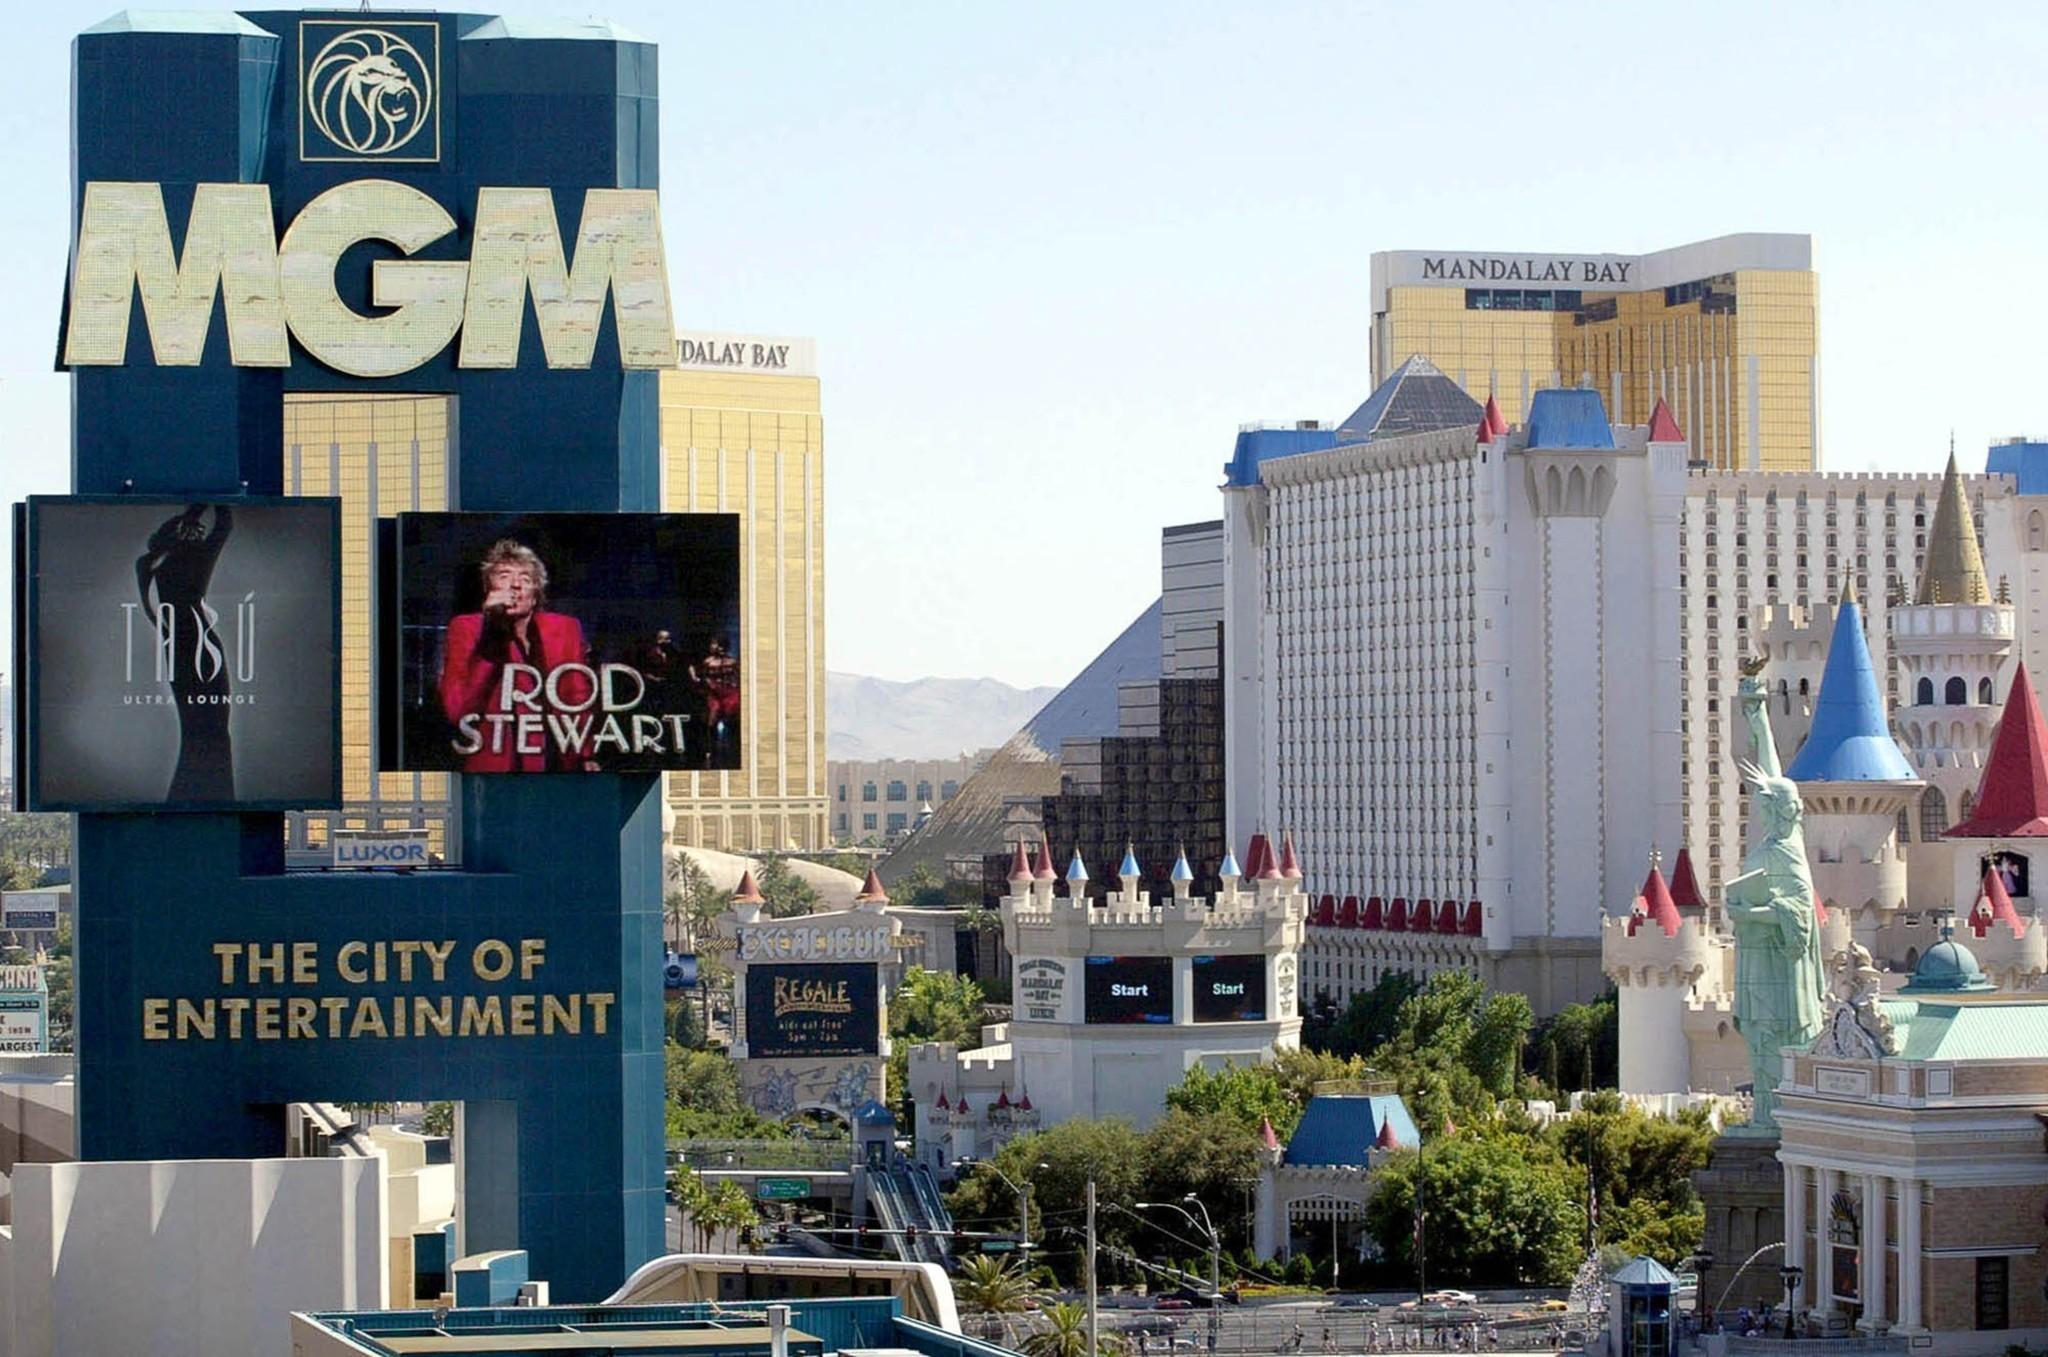 mgm grand slot machine list